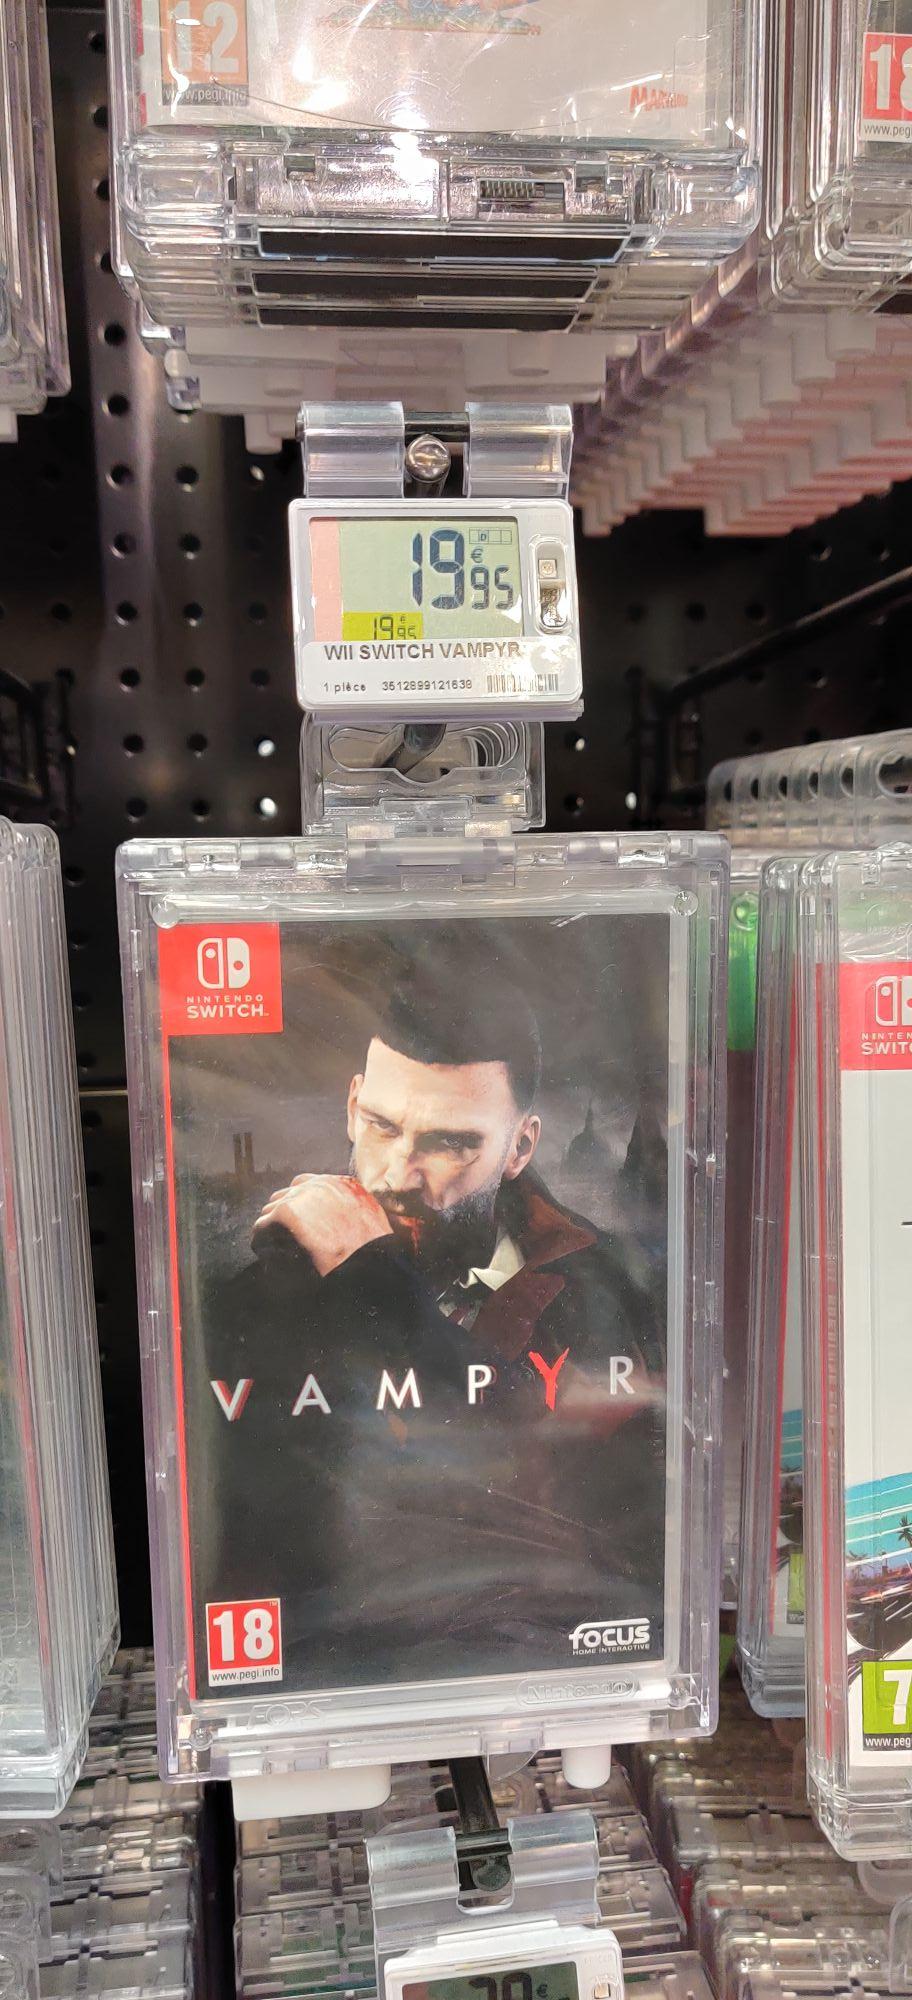 Vampyr sur Switch - Les Ulis (91)